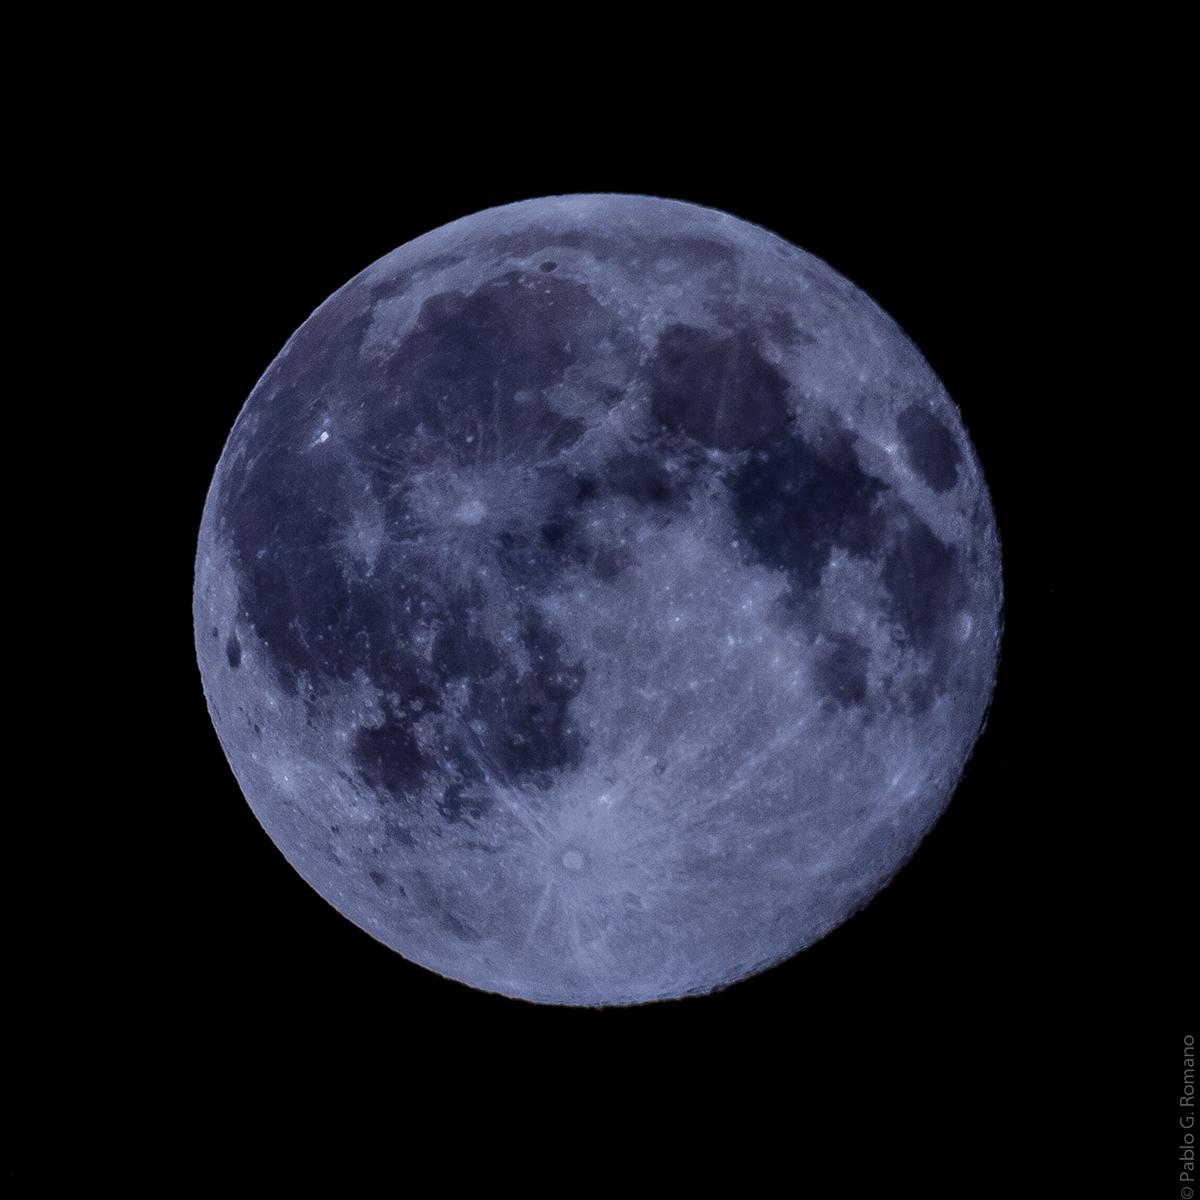 Astrofotografia astrophotography moon BLUEMOON Space  luna luna llena luna azul via lactea milkyway asteroides Asteroids